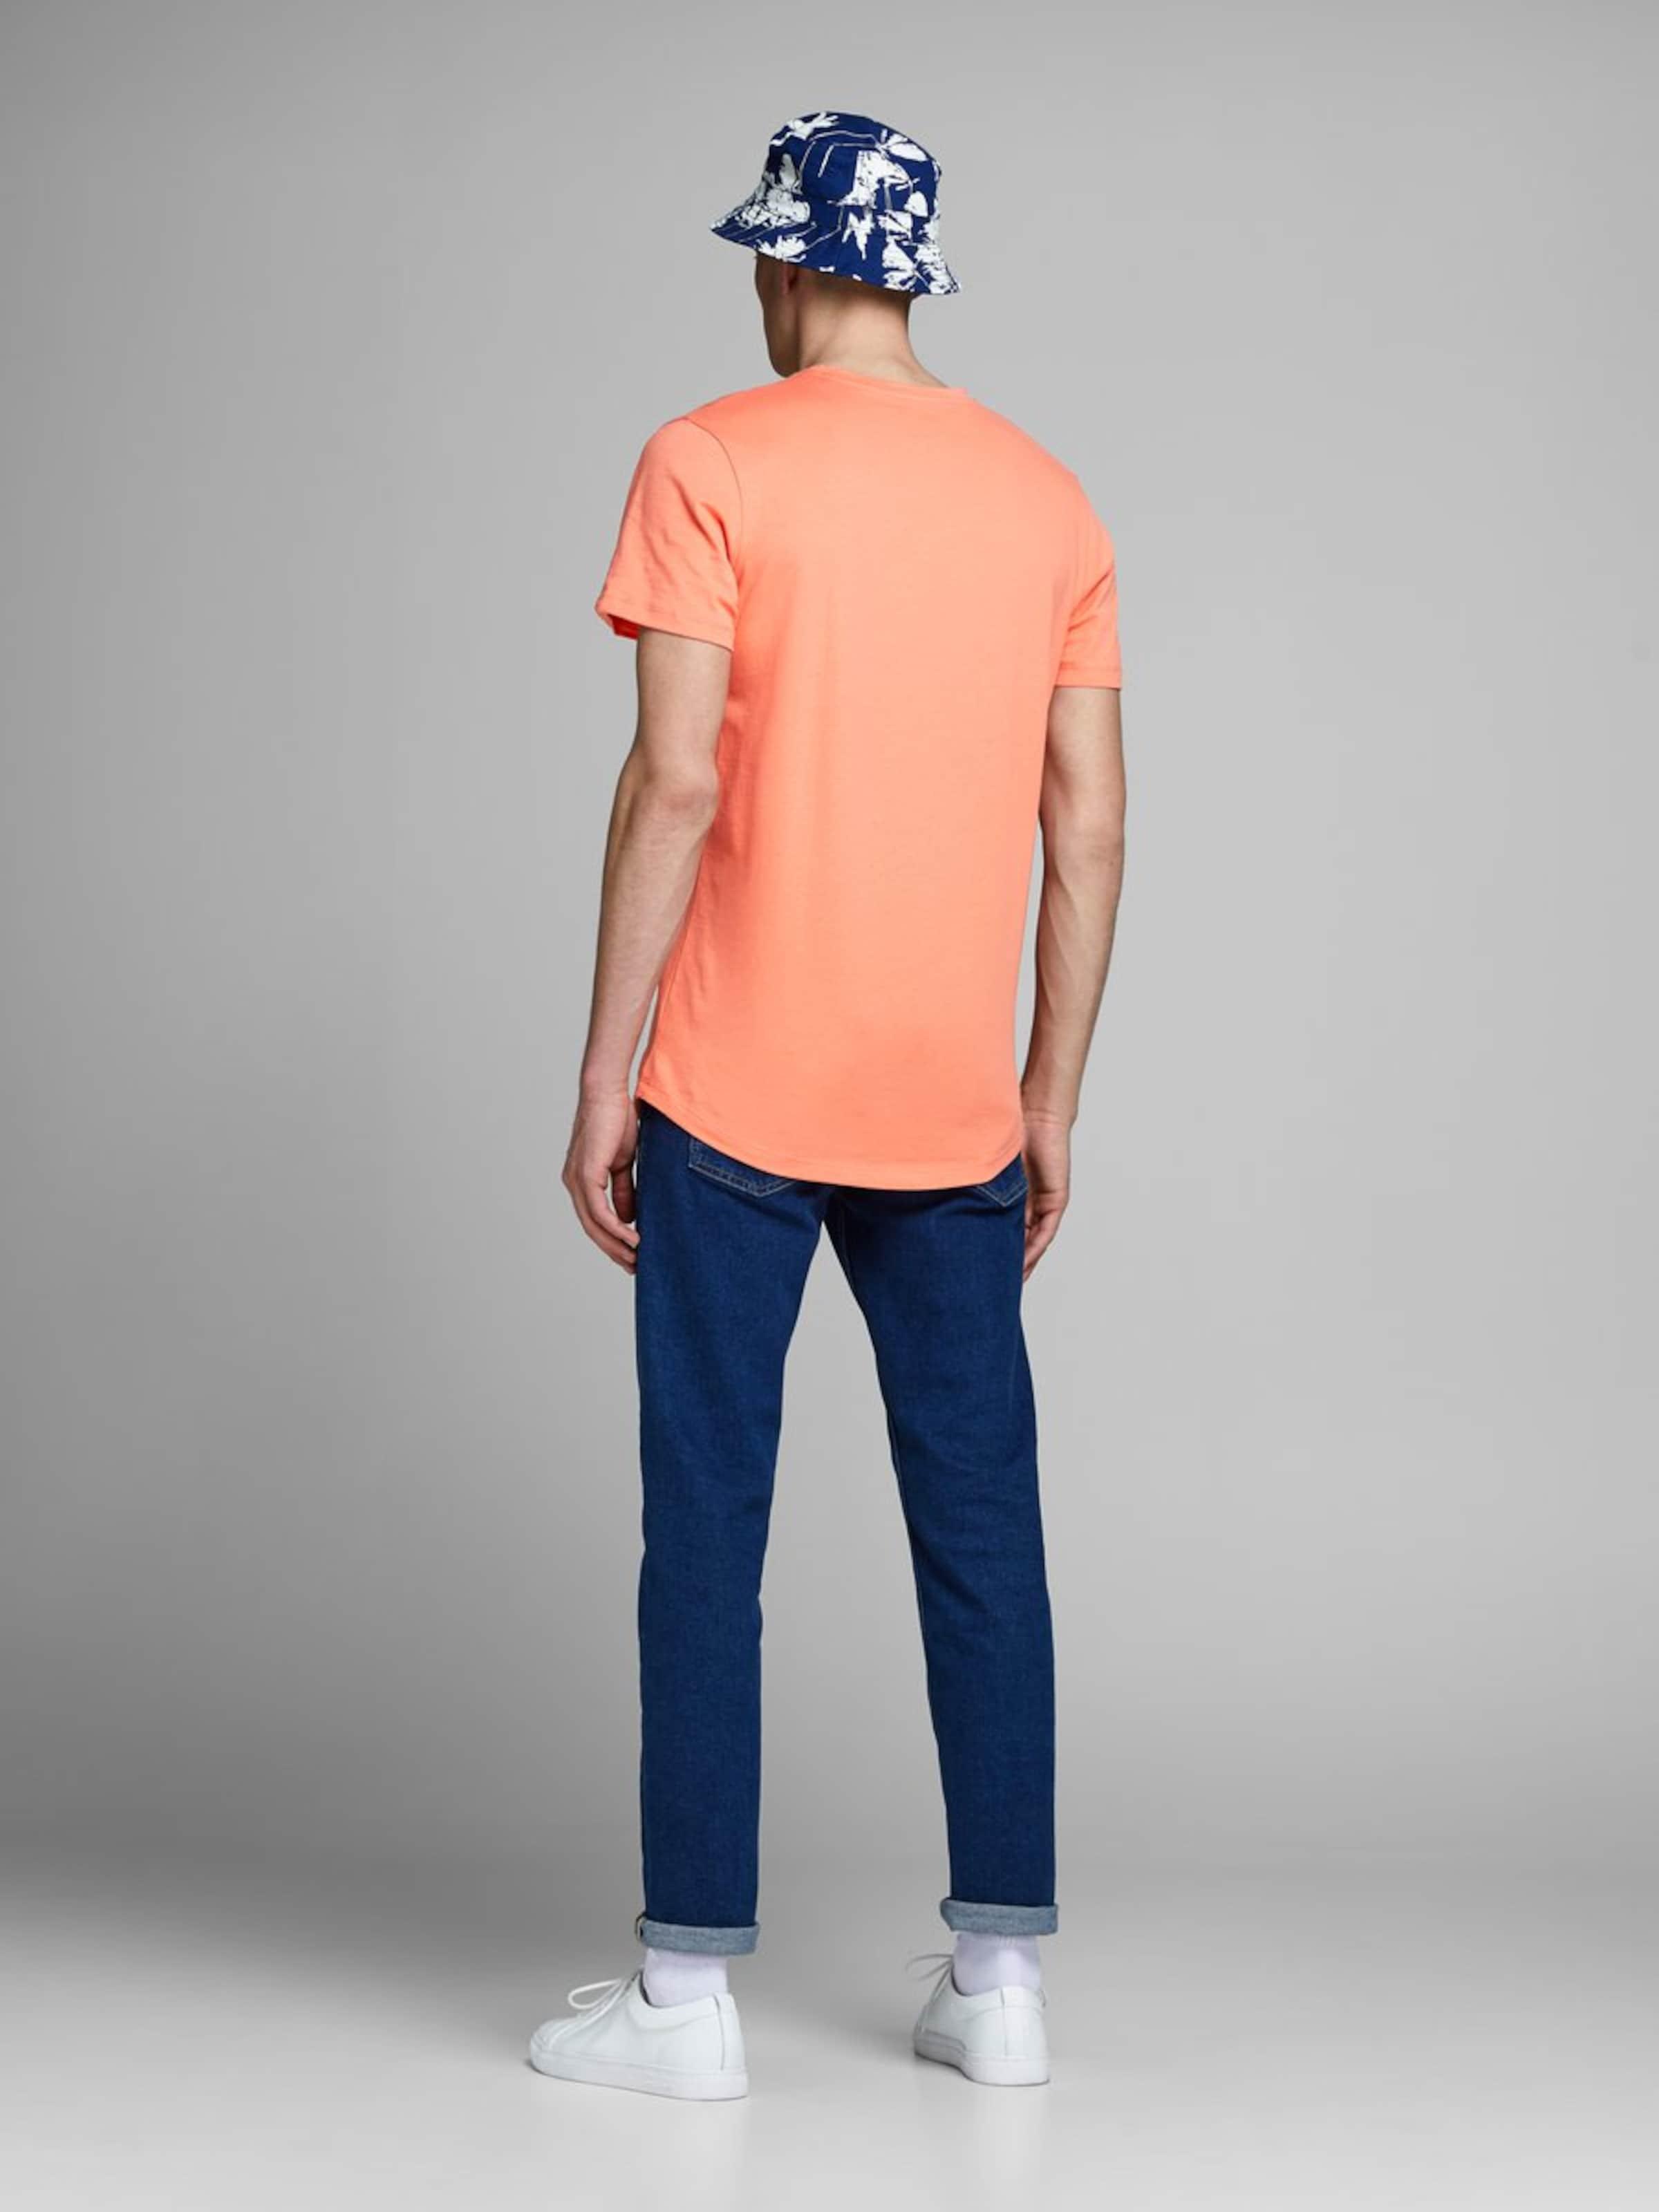 MischfarbenLachs Jackamp; Jones T shirt In Y6bf7gy